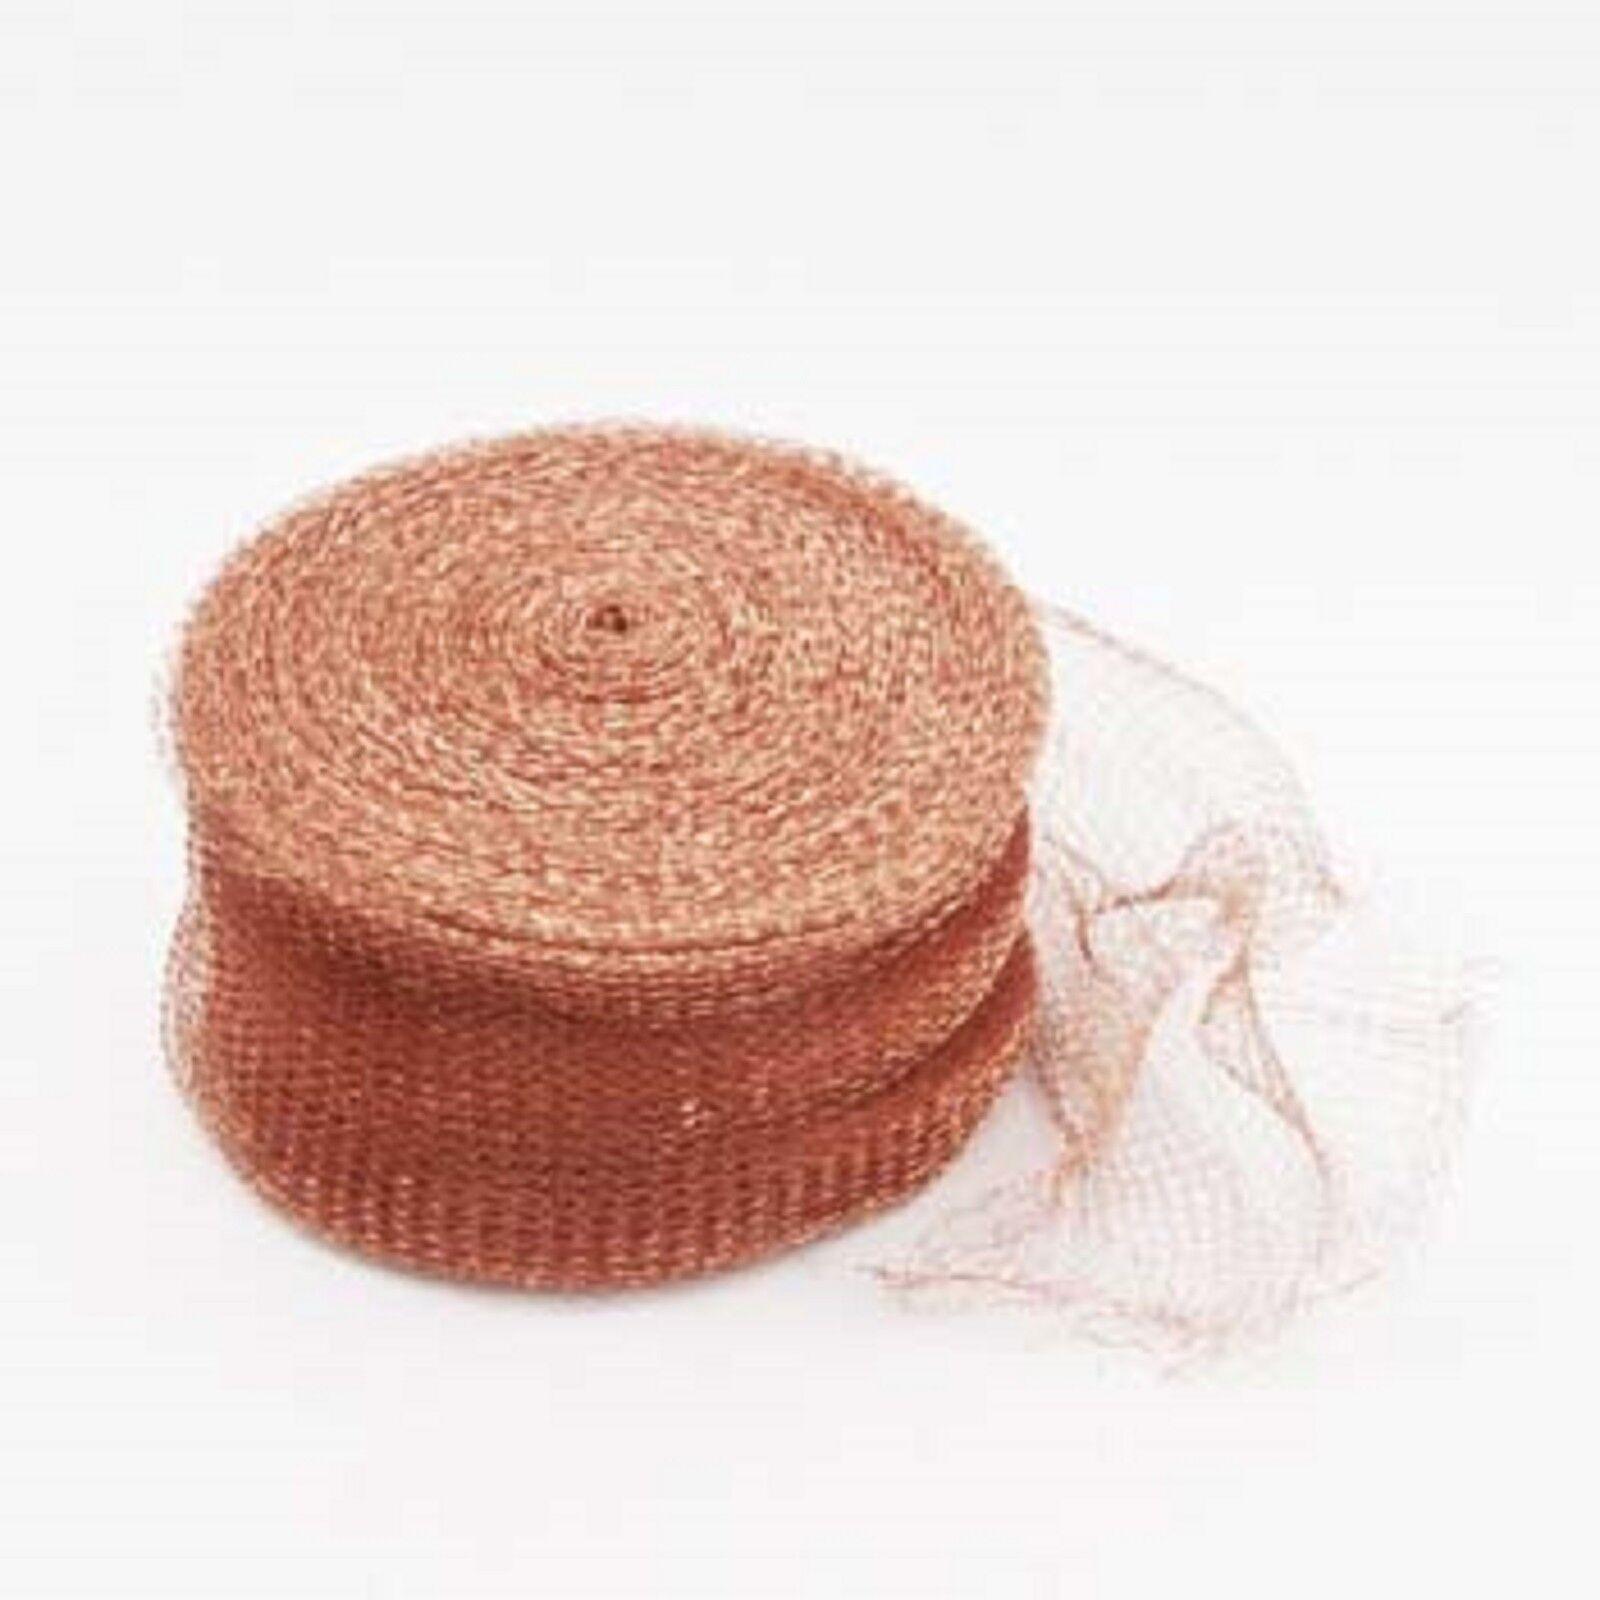 $3.75 - 100% copper mesh packing Moonshine E85 2